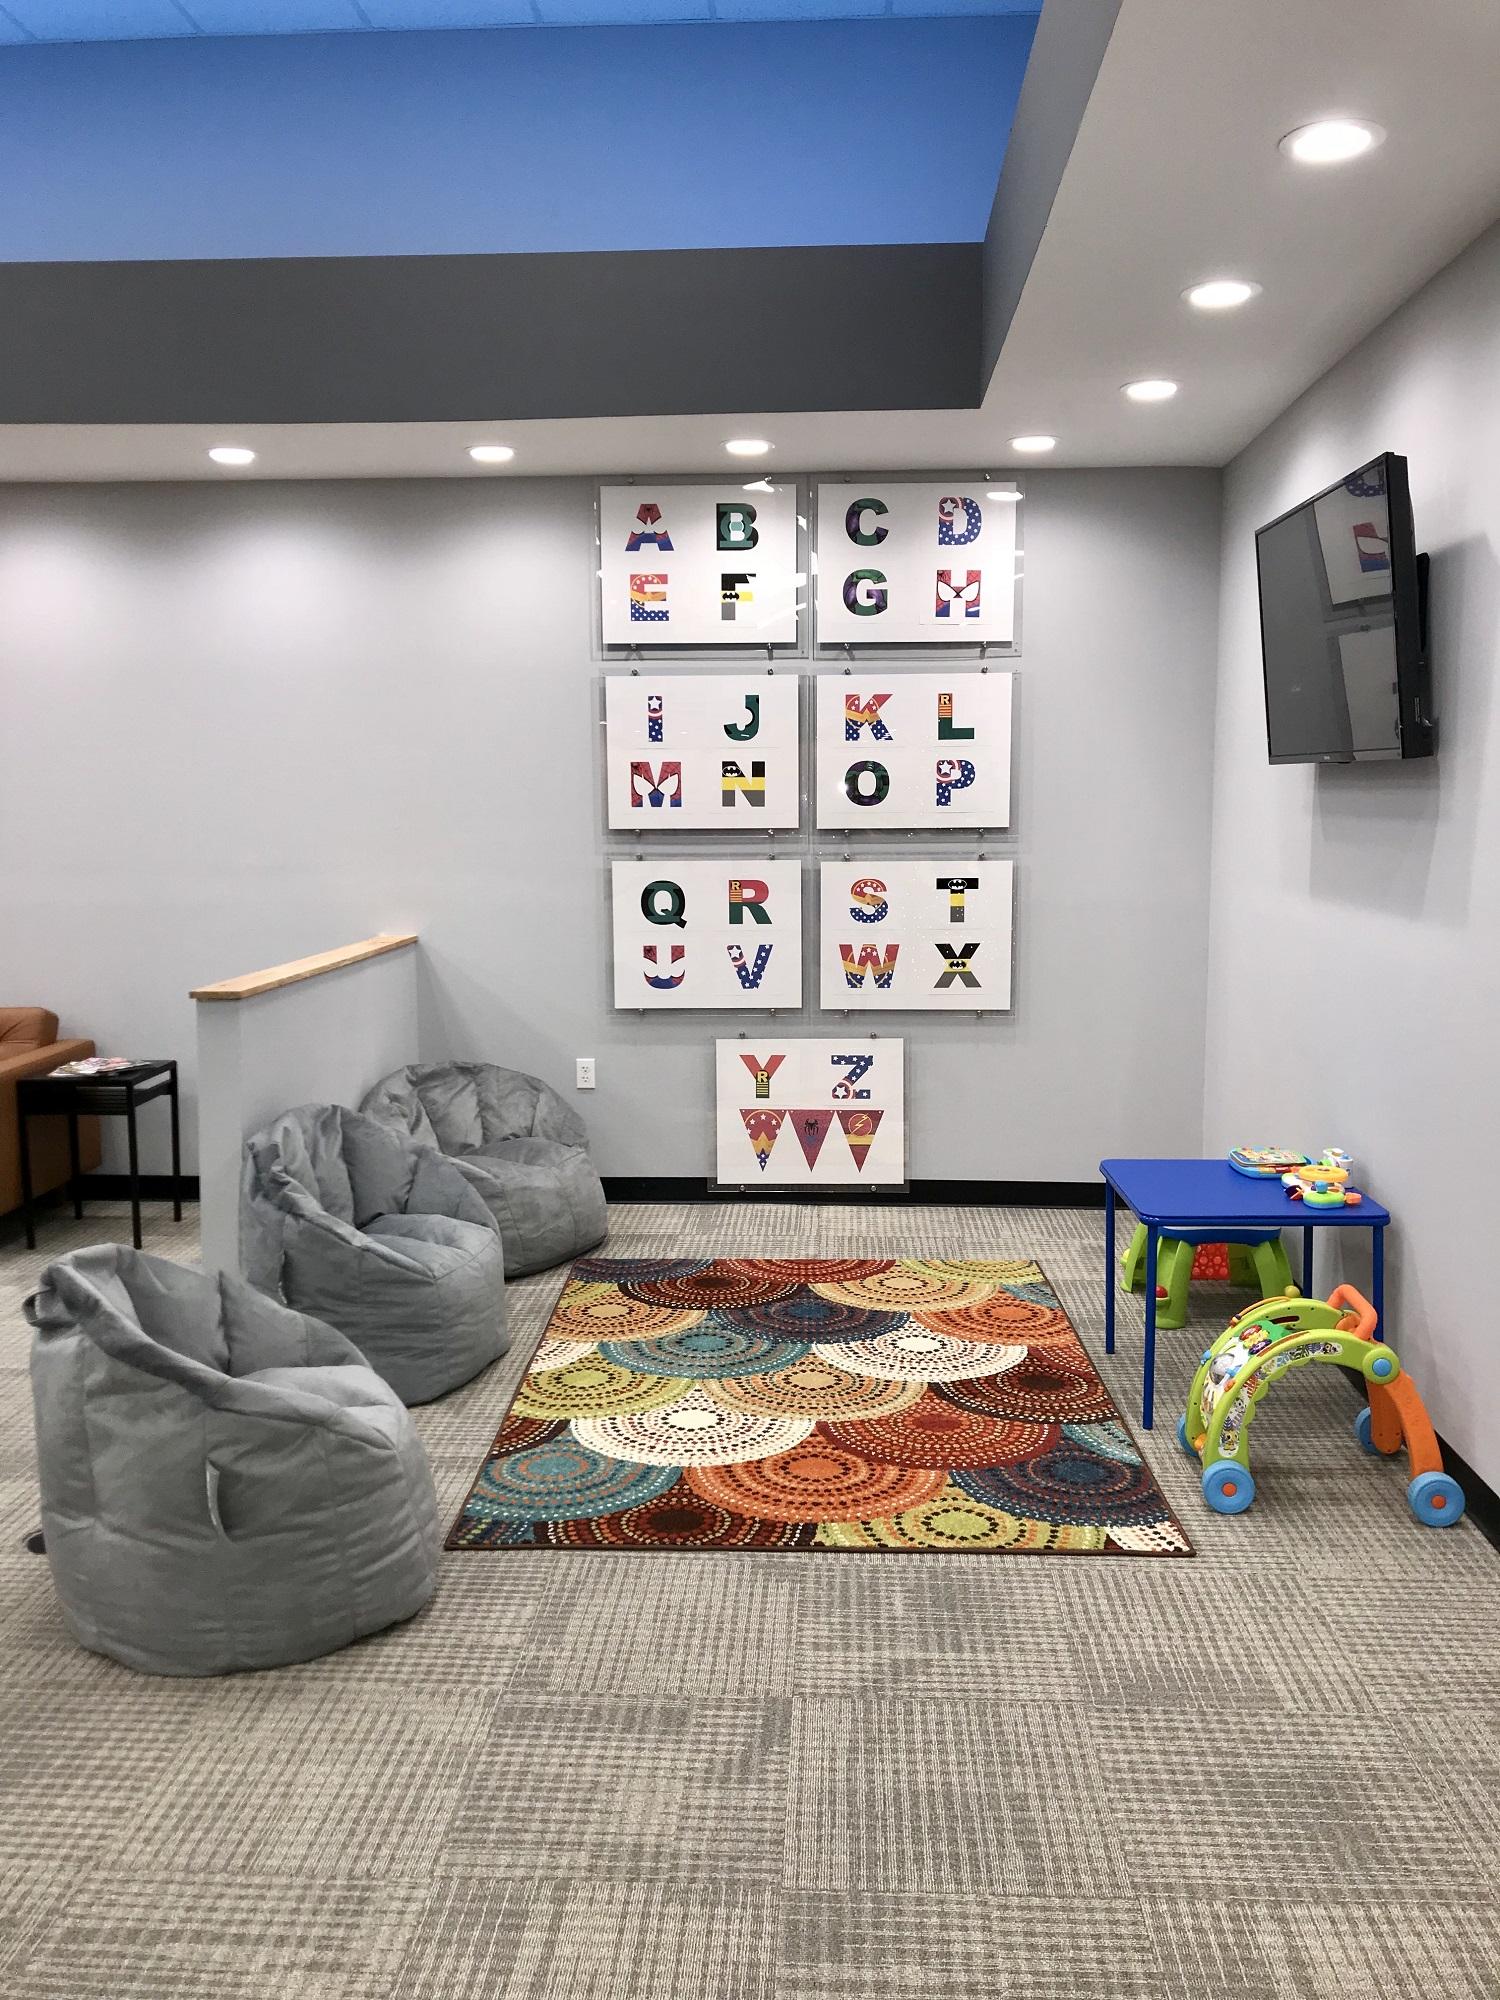 Children's waiting area